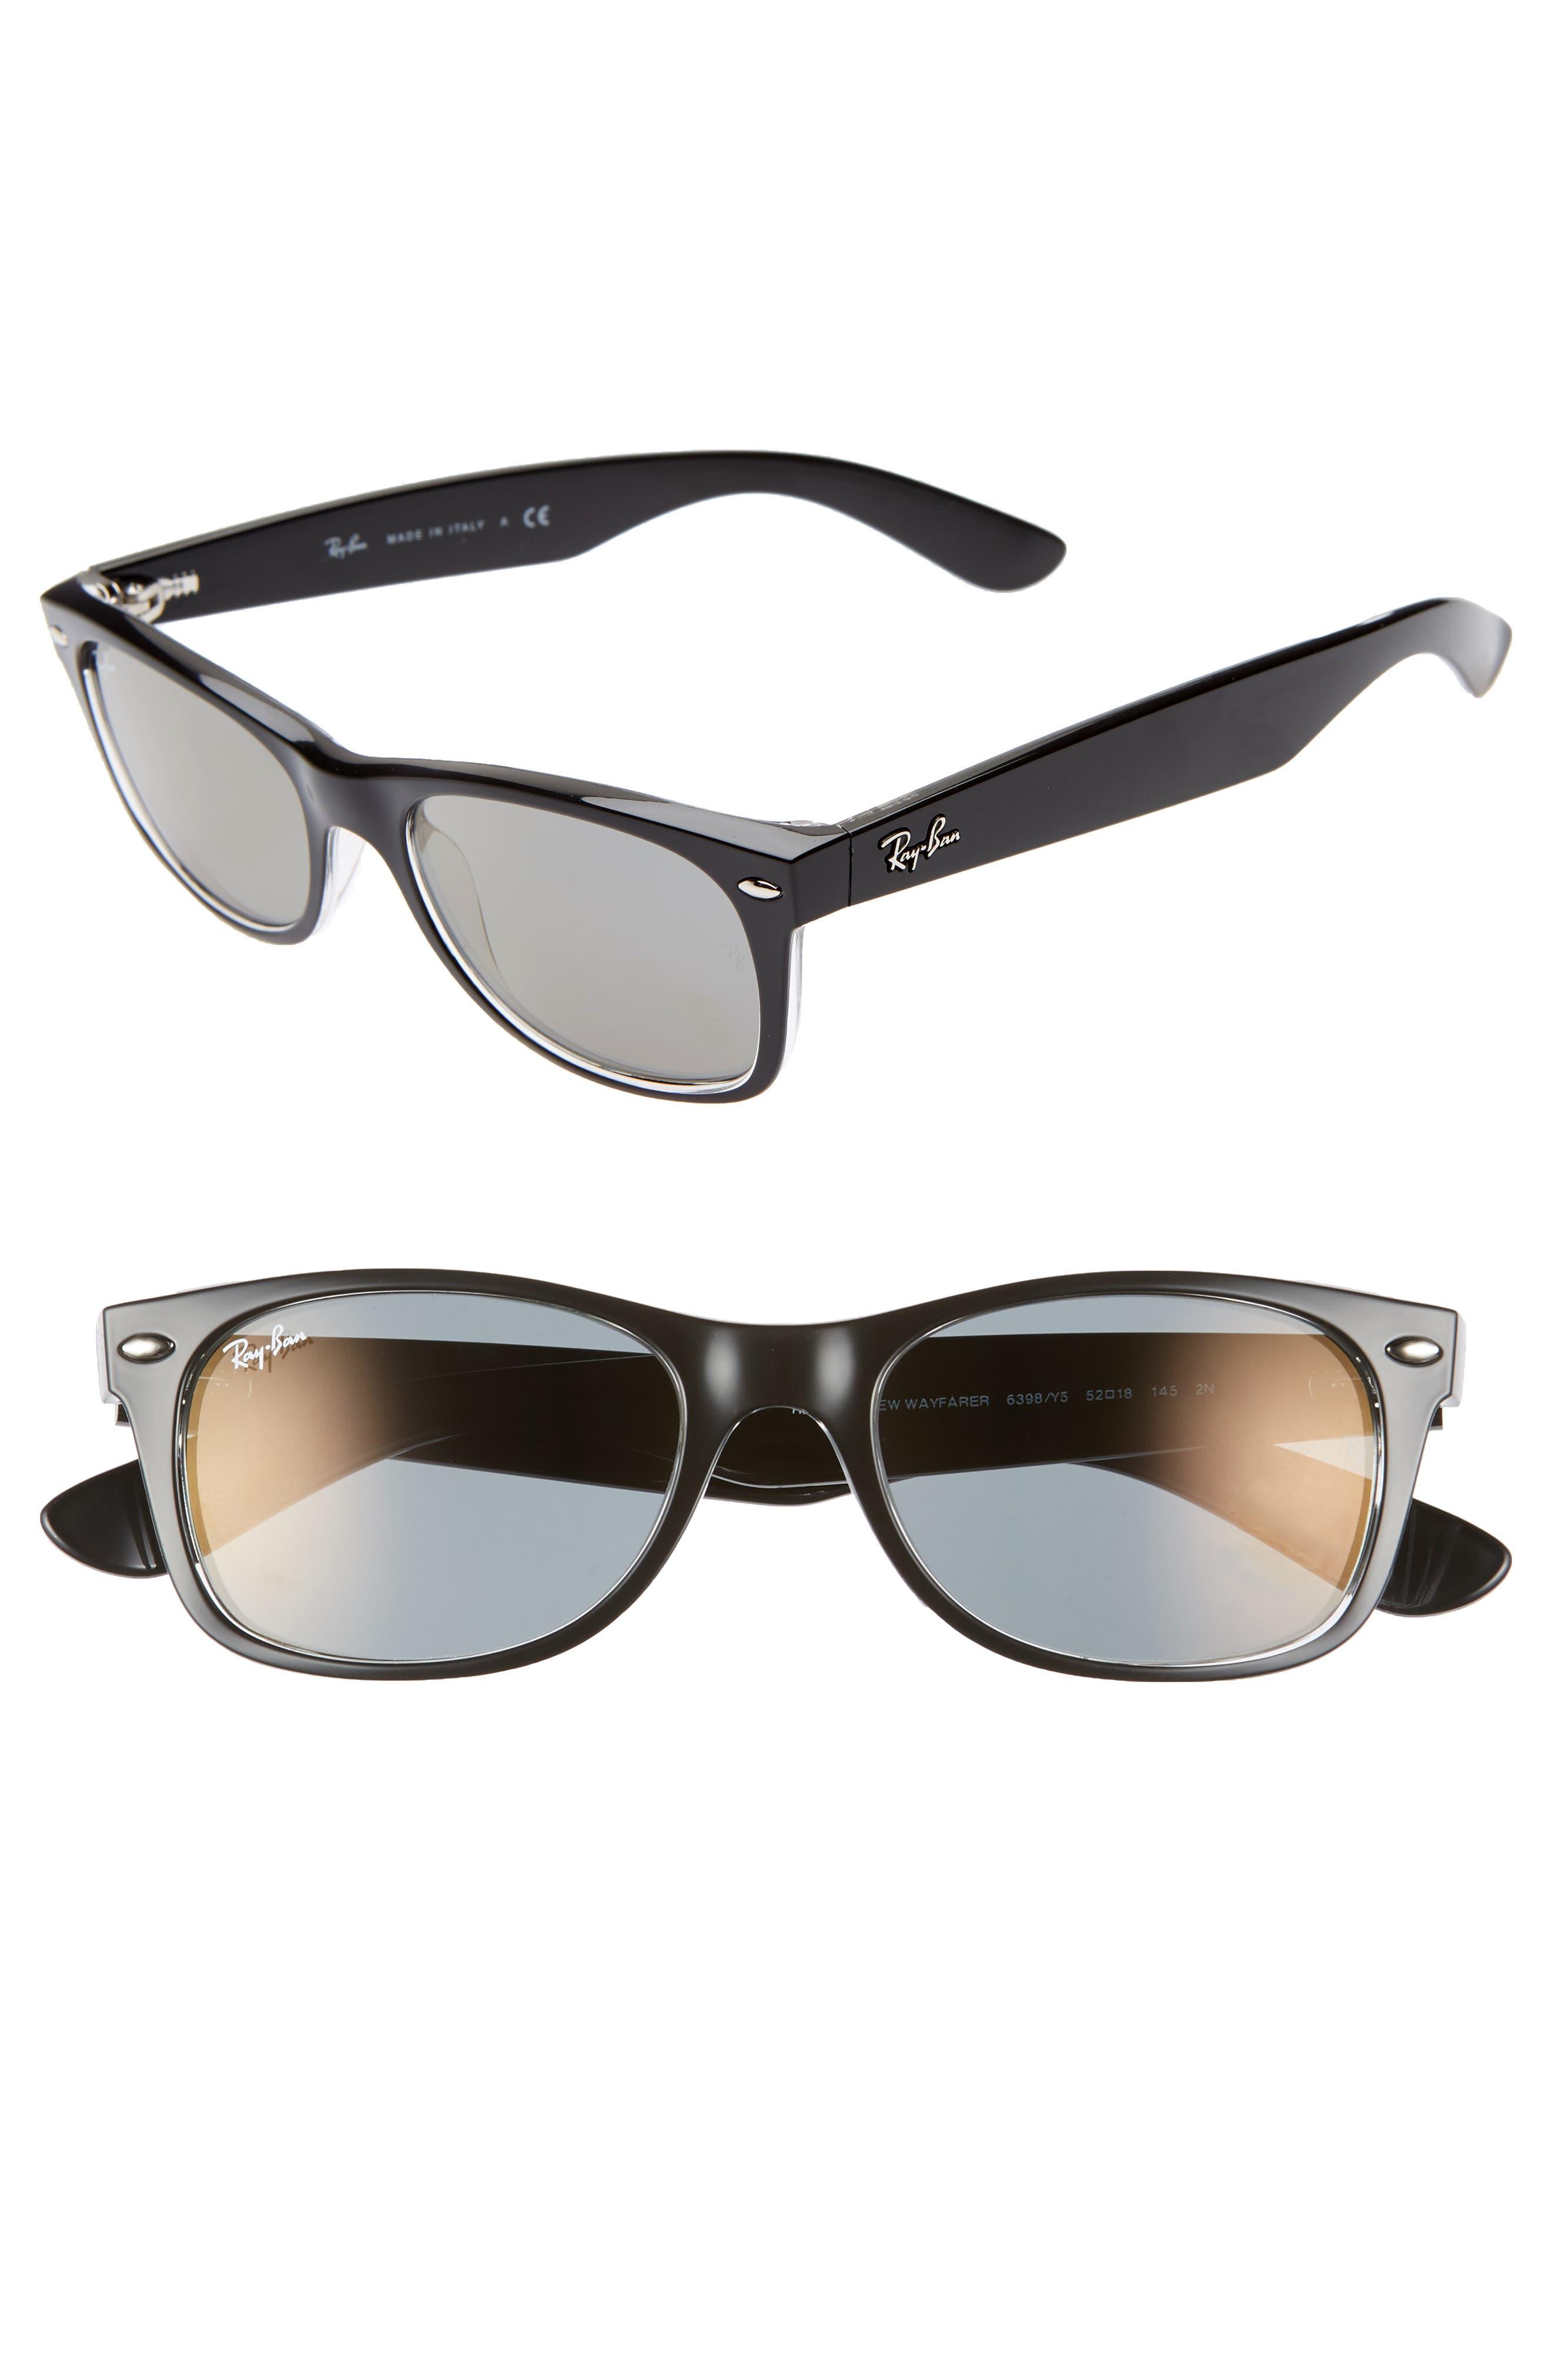 Ray-Ban New Wayfarer Classic 52Mm Sunglasses - Transparent Black Mirror